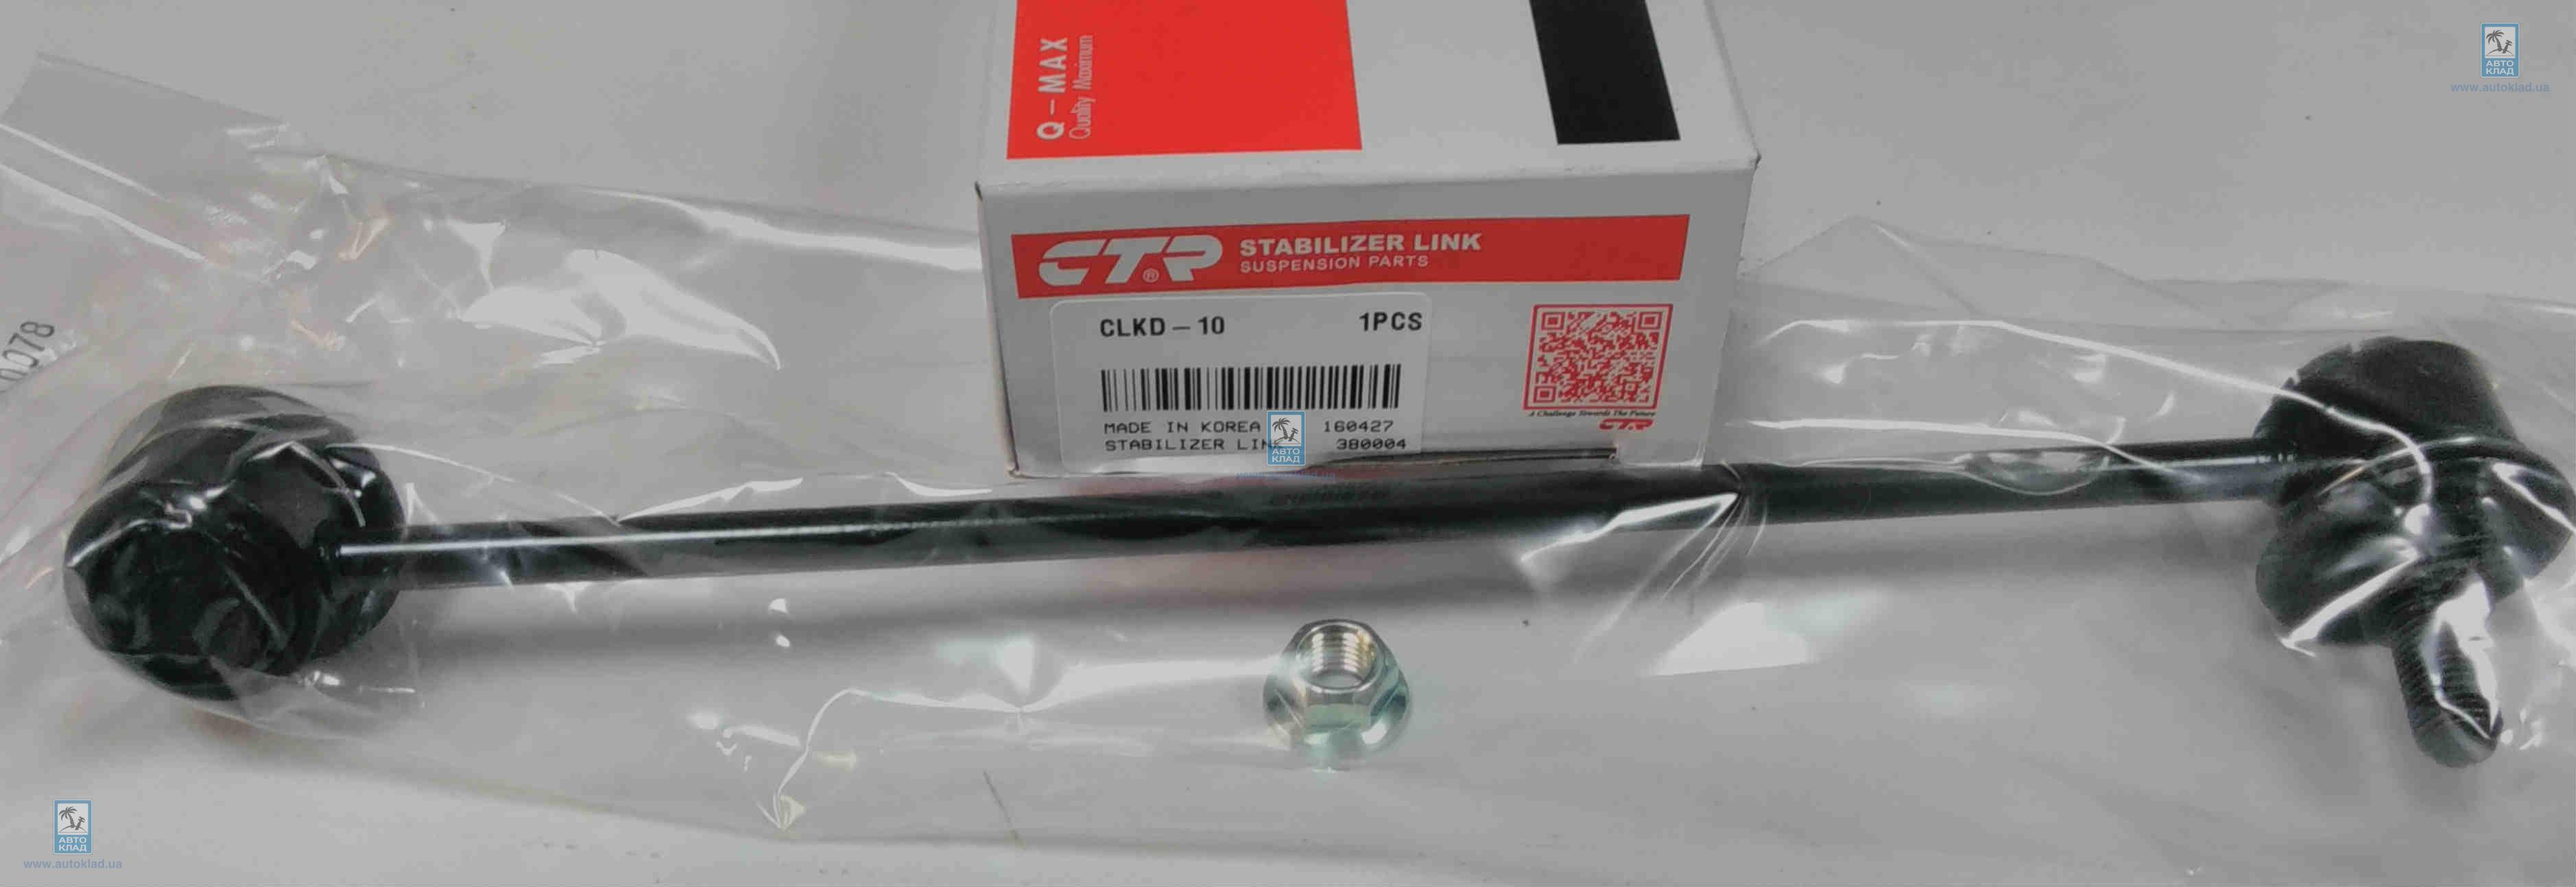 Стойка стабилизатора CTR CLKD-10